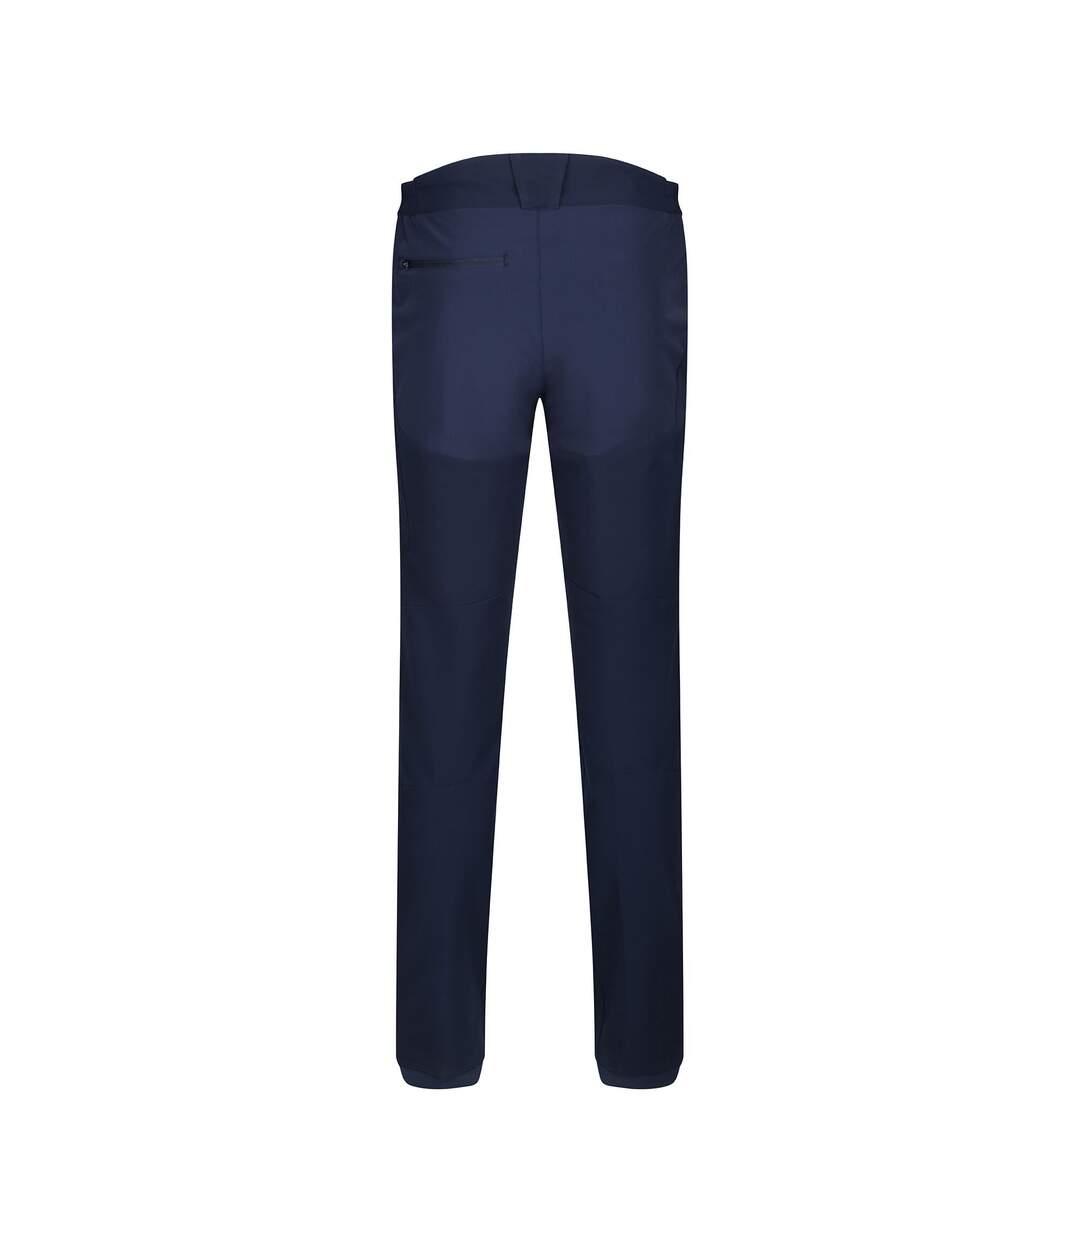 Regatta Mens X-Pro Prolite Trousers (Navy) - UTRG5607